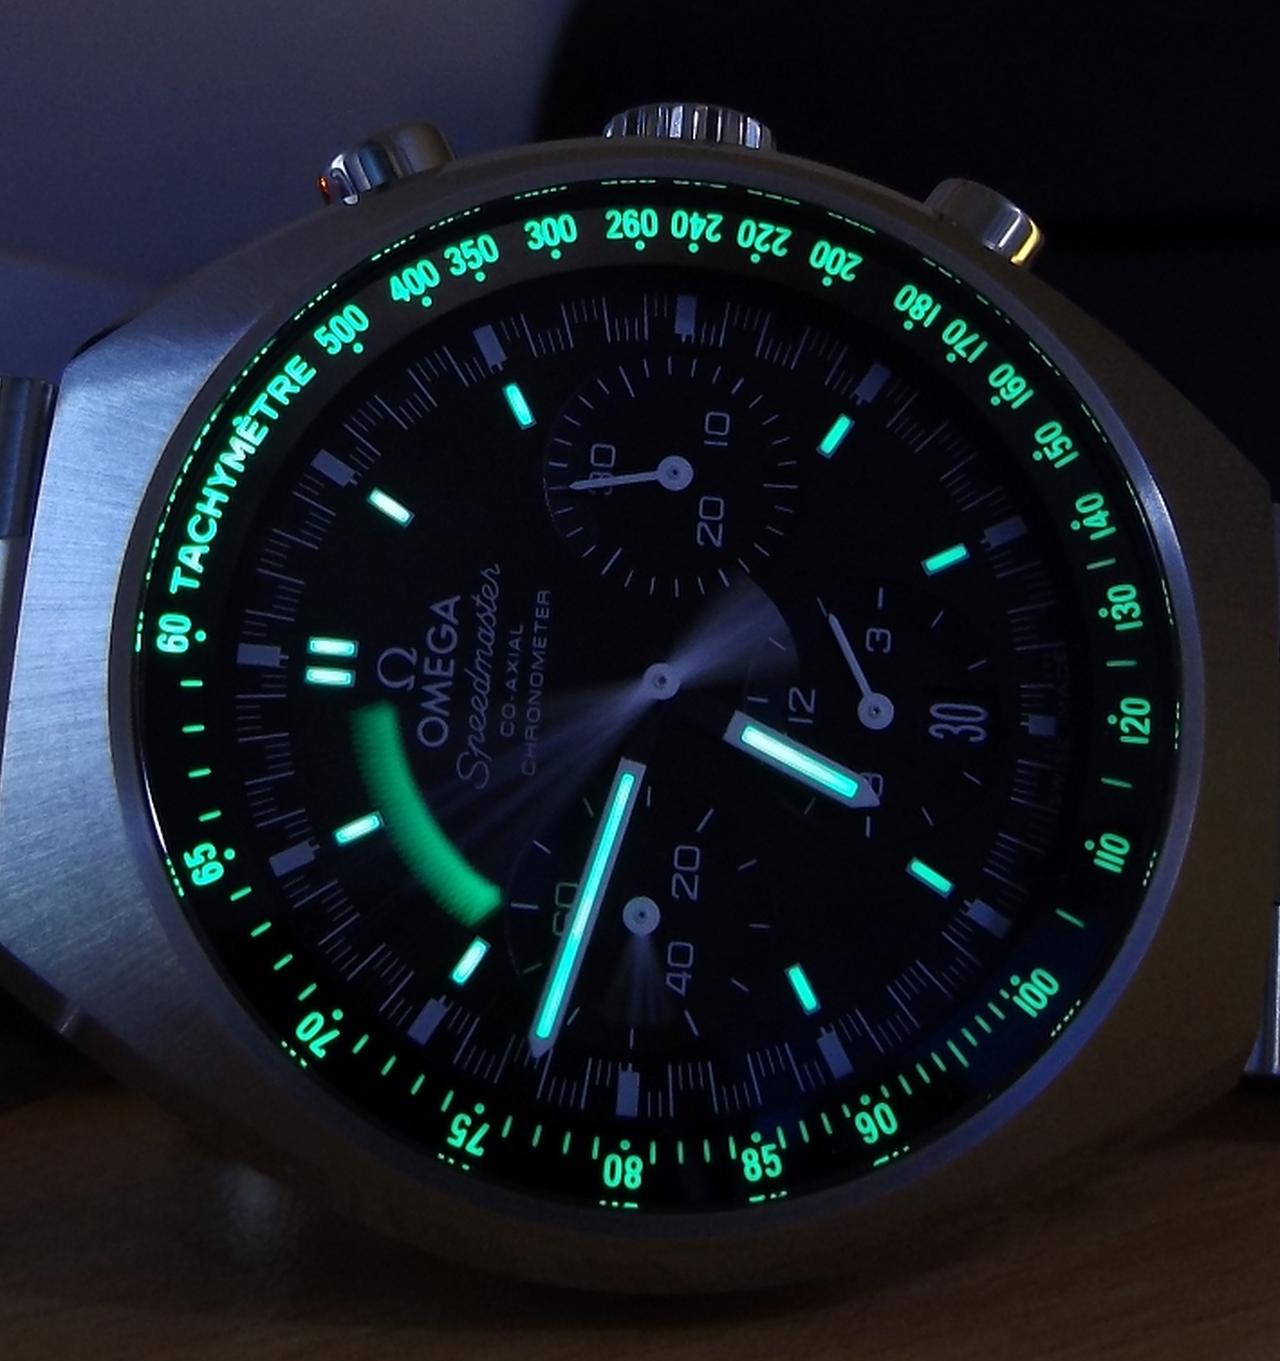 OMEGA Speedmaster Mark II Re-Edition Chronograph Circa 2014